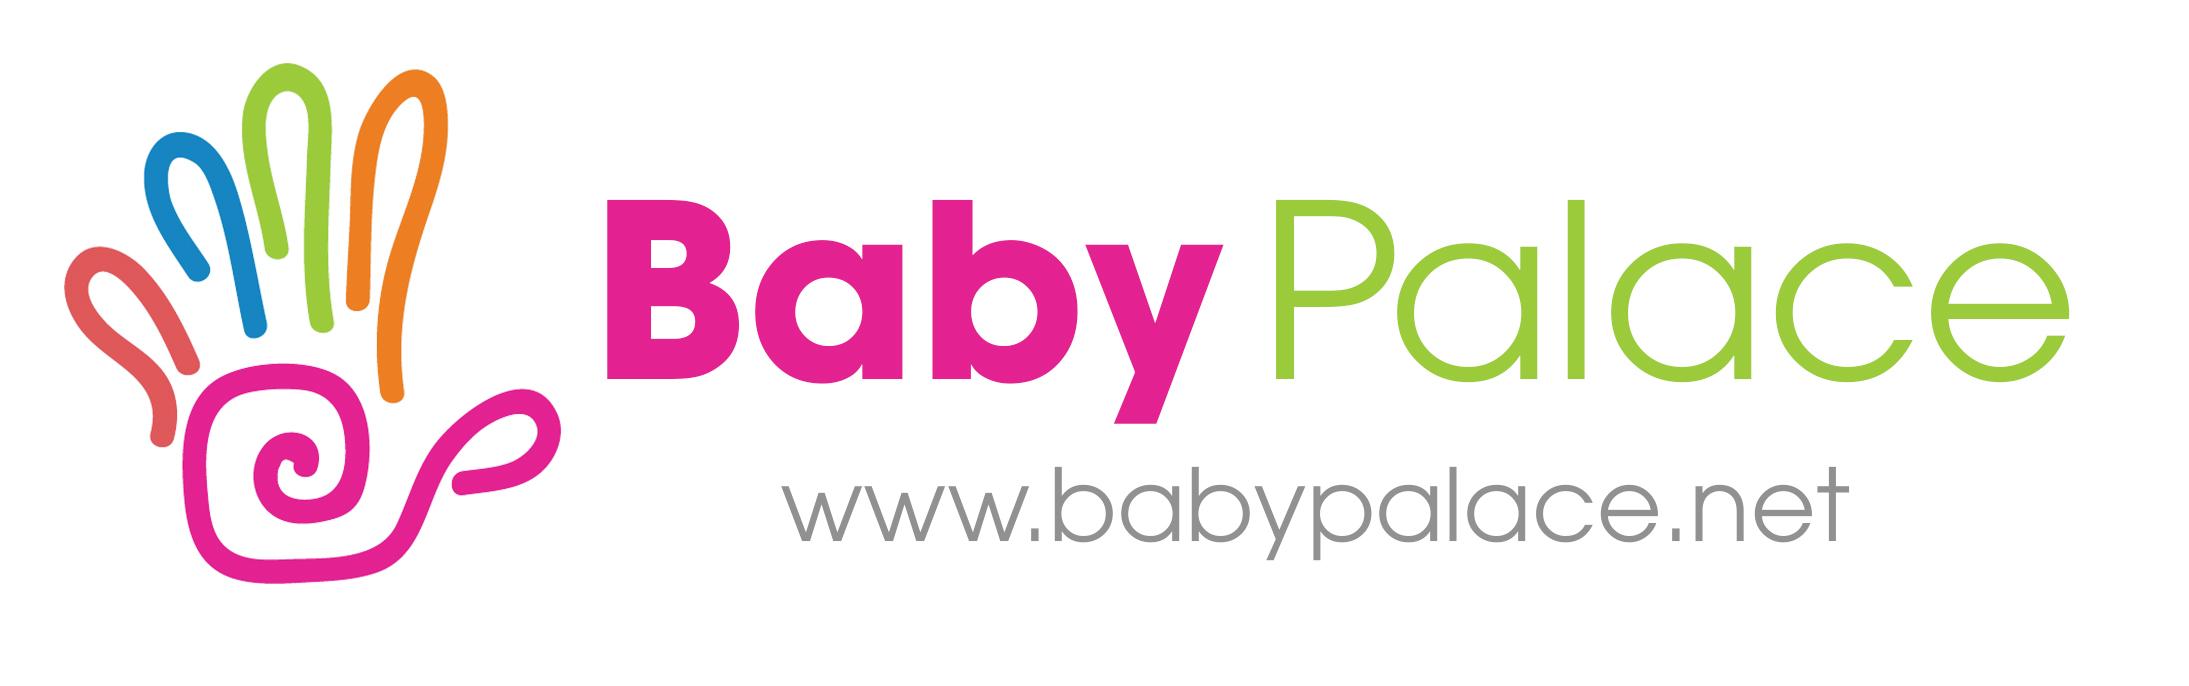 BabyPalace.net